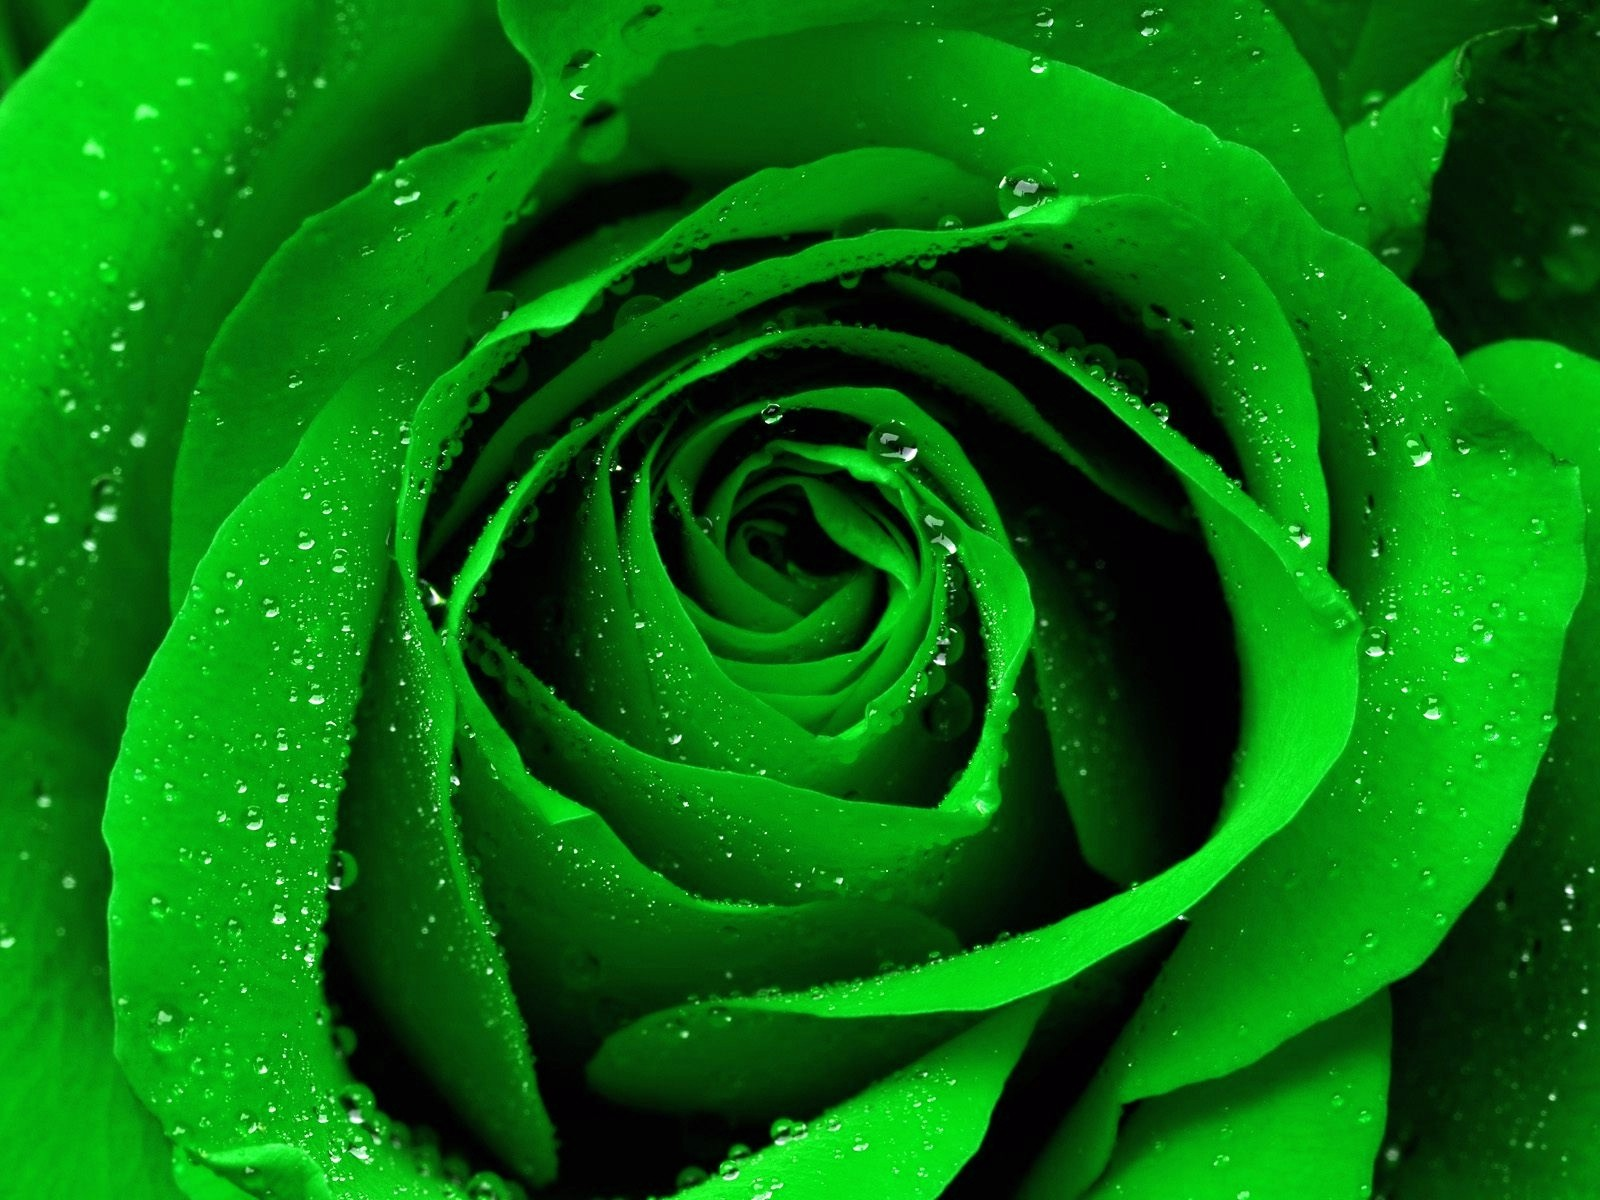 картинка зеленого каталог